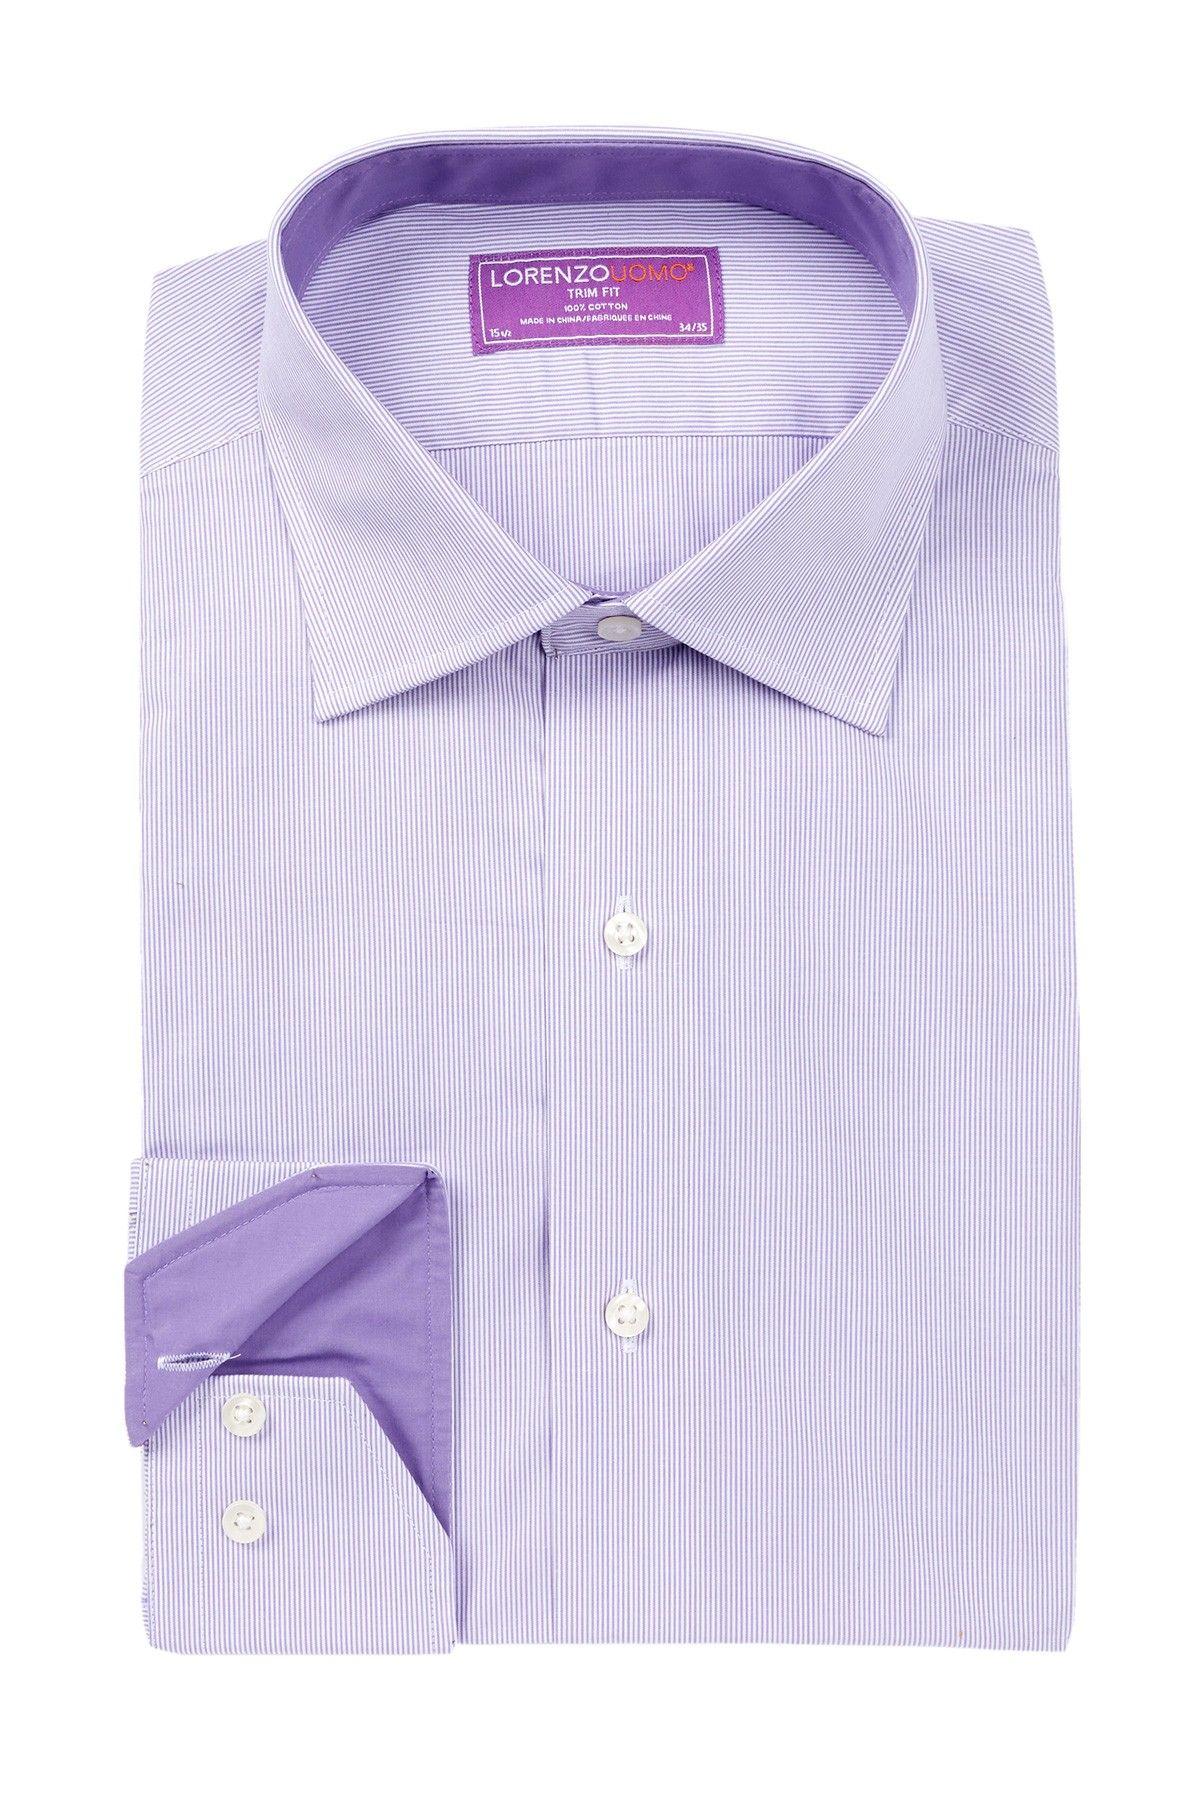 Lorenzo Uomo | Long Sleeve Trim Fit Thin Stripe Dress Shirt